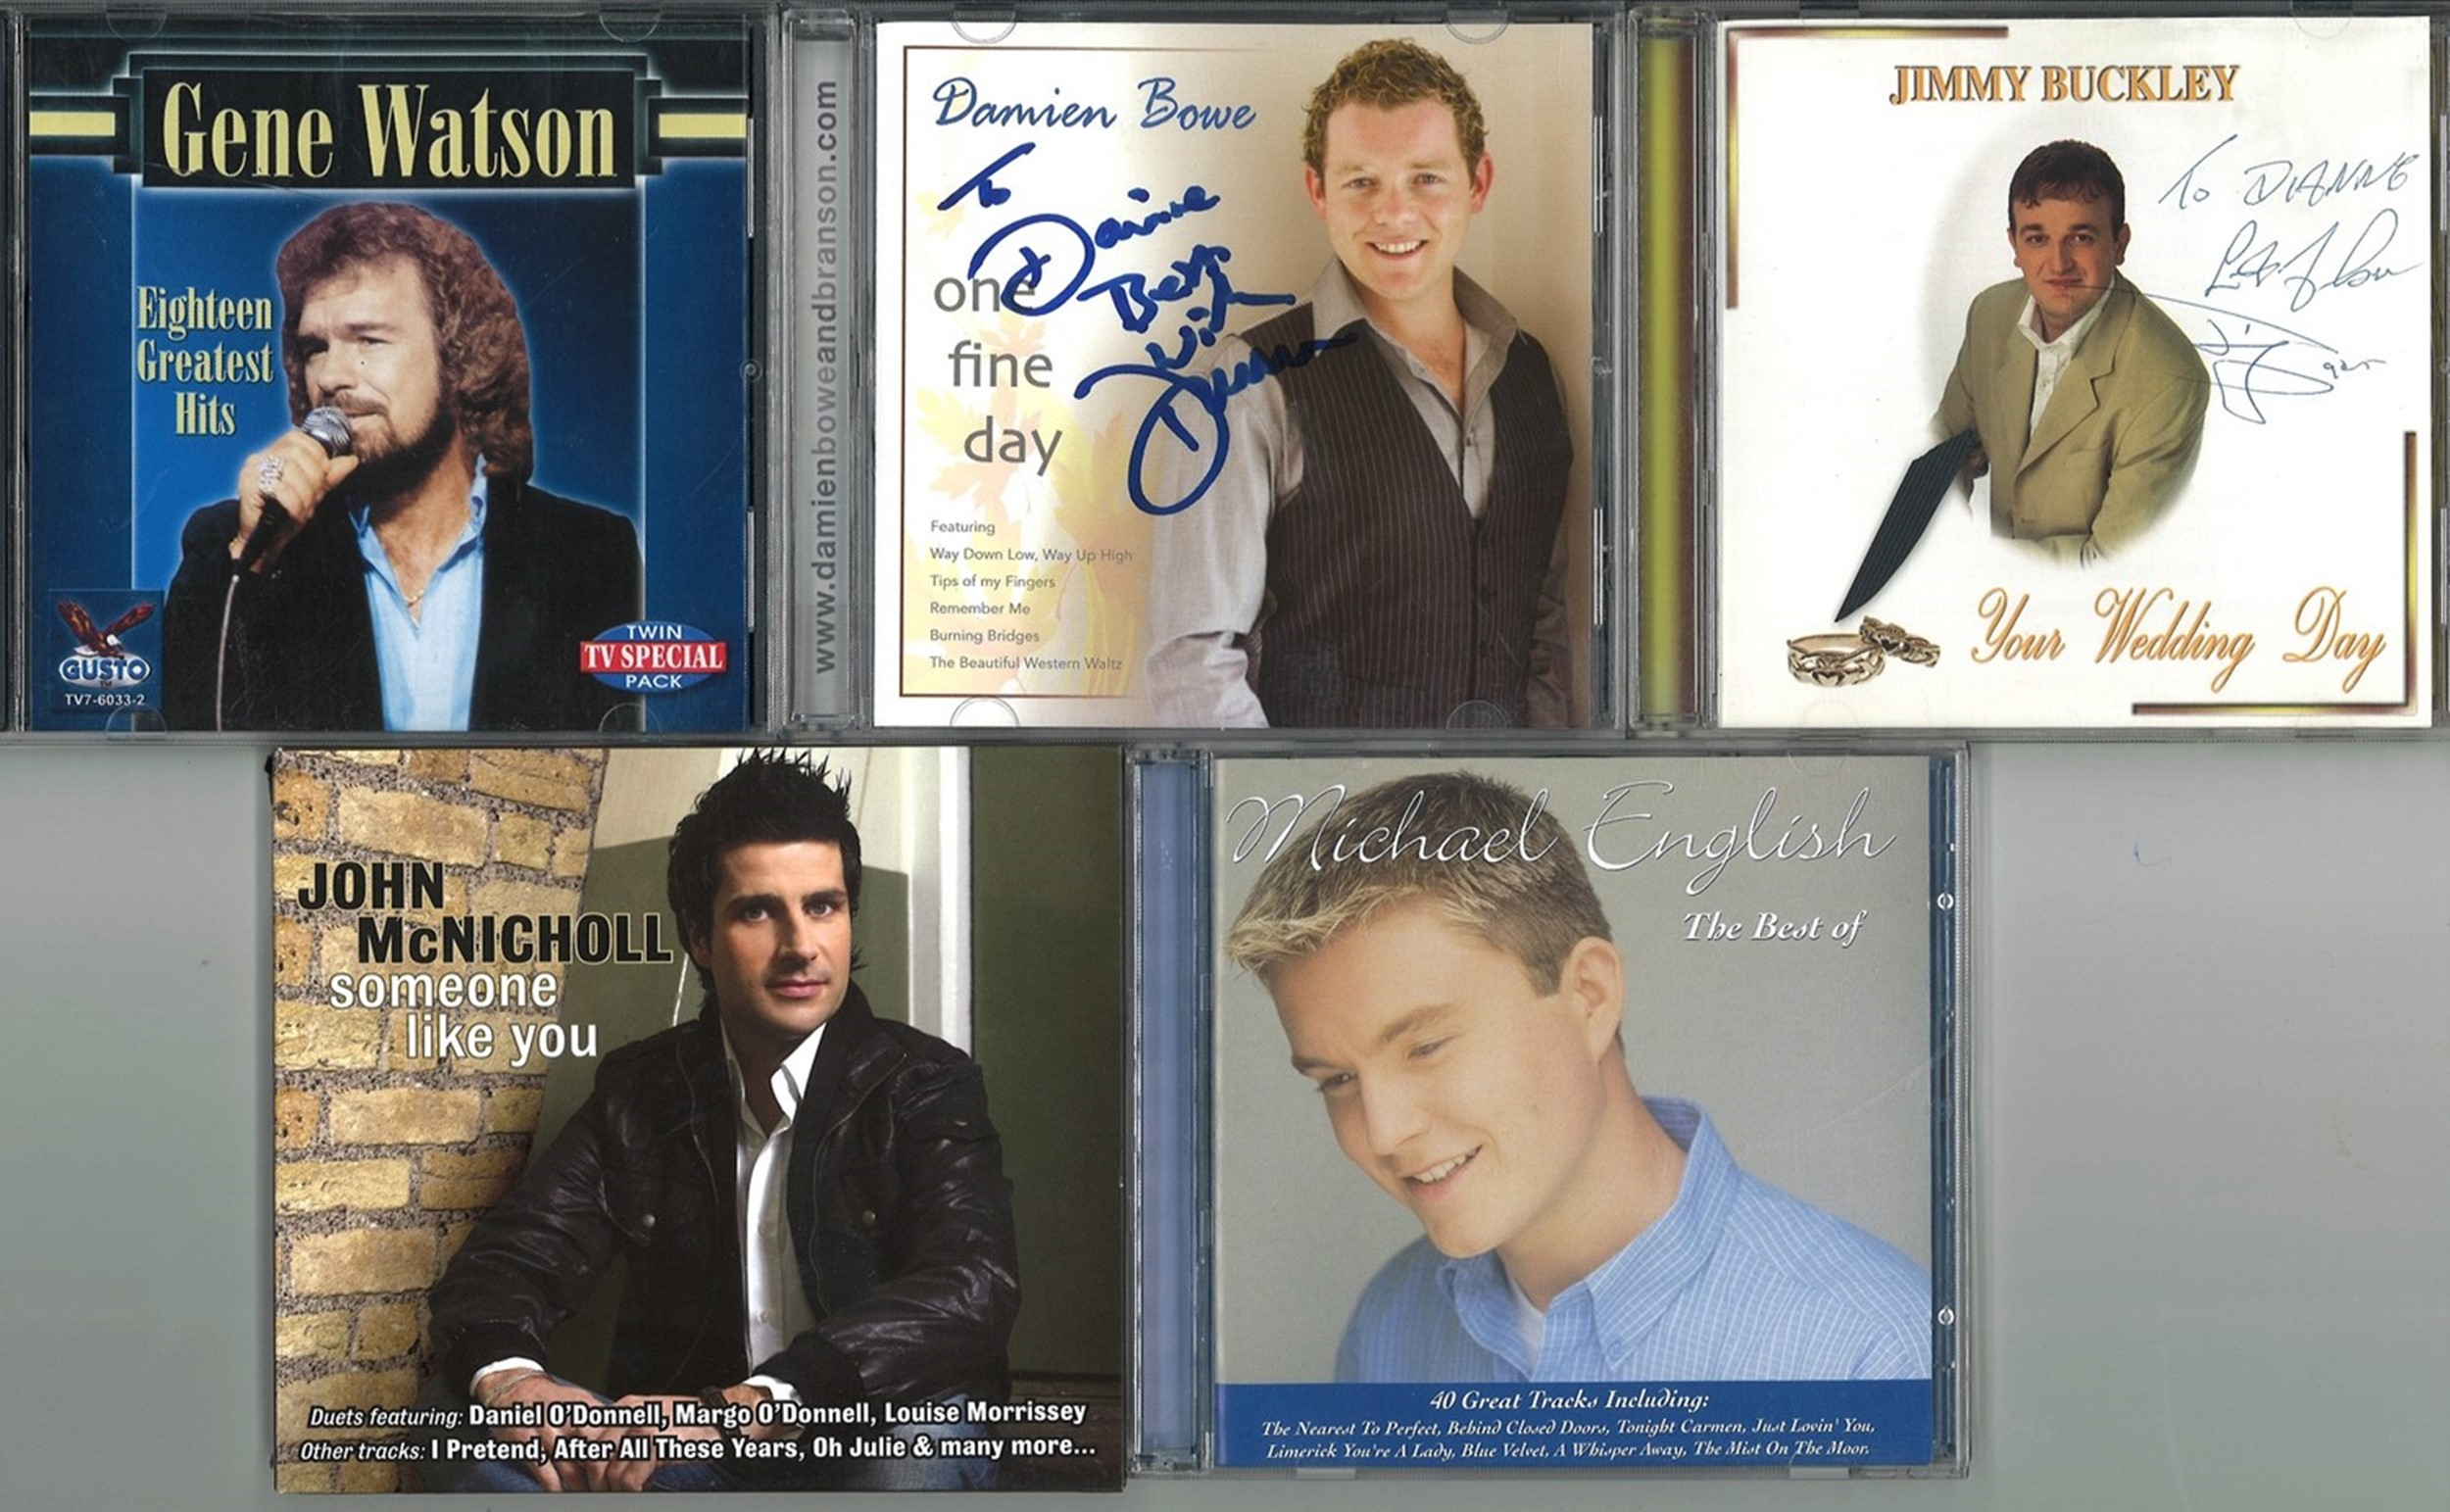 Collection of Five Signed CDs, Damien Bowe, John McNicholl, Jimmy Buckley, Gene Watson, Michael